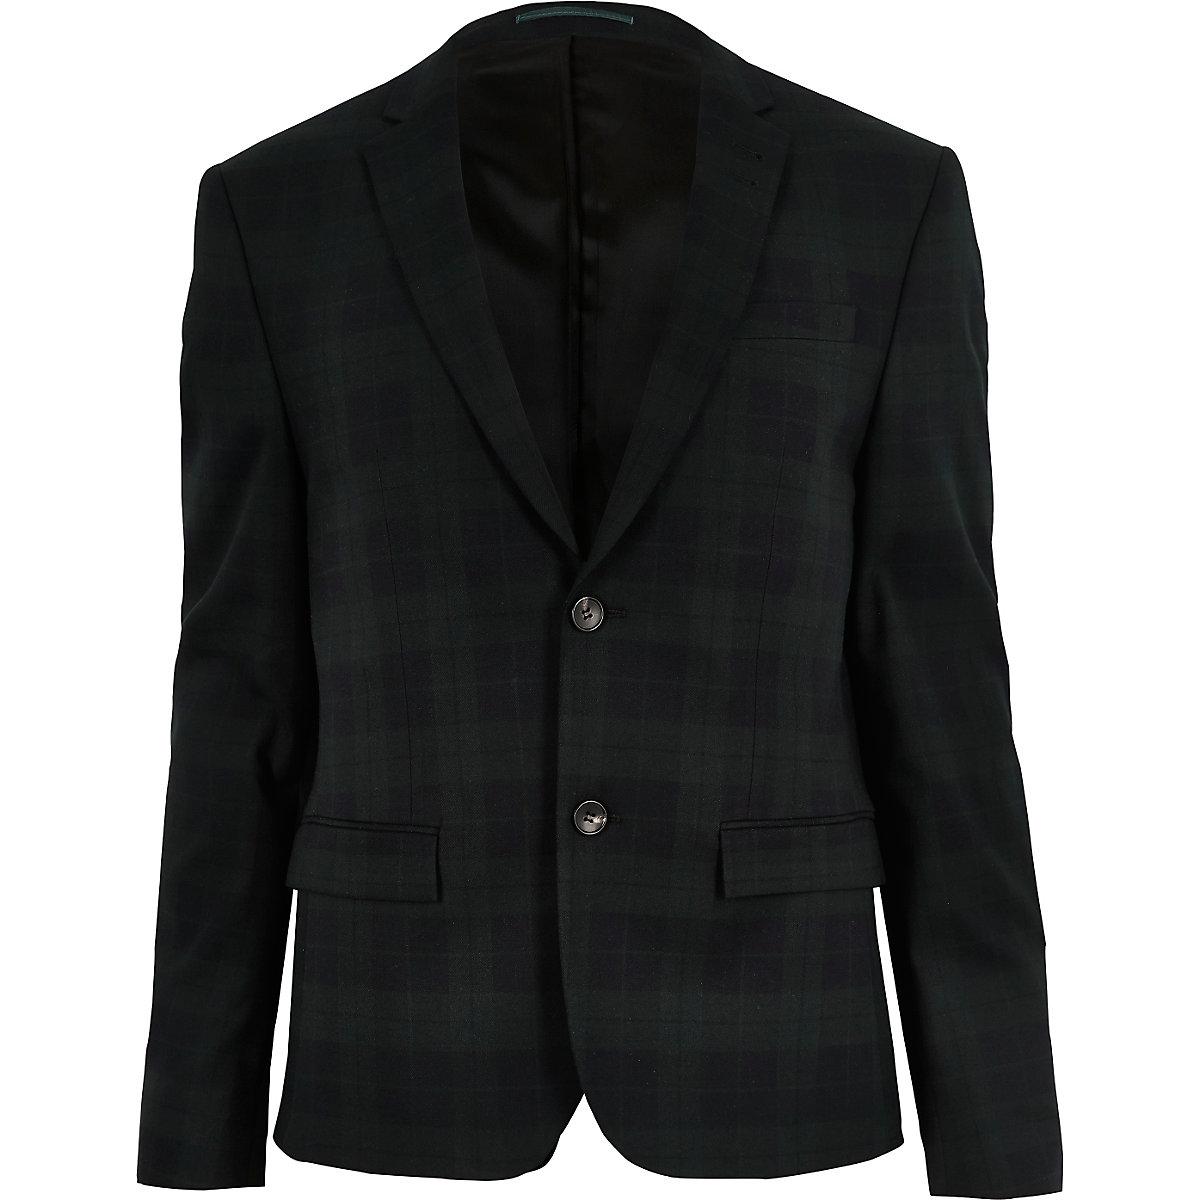 Green tartan skinny suit jacket